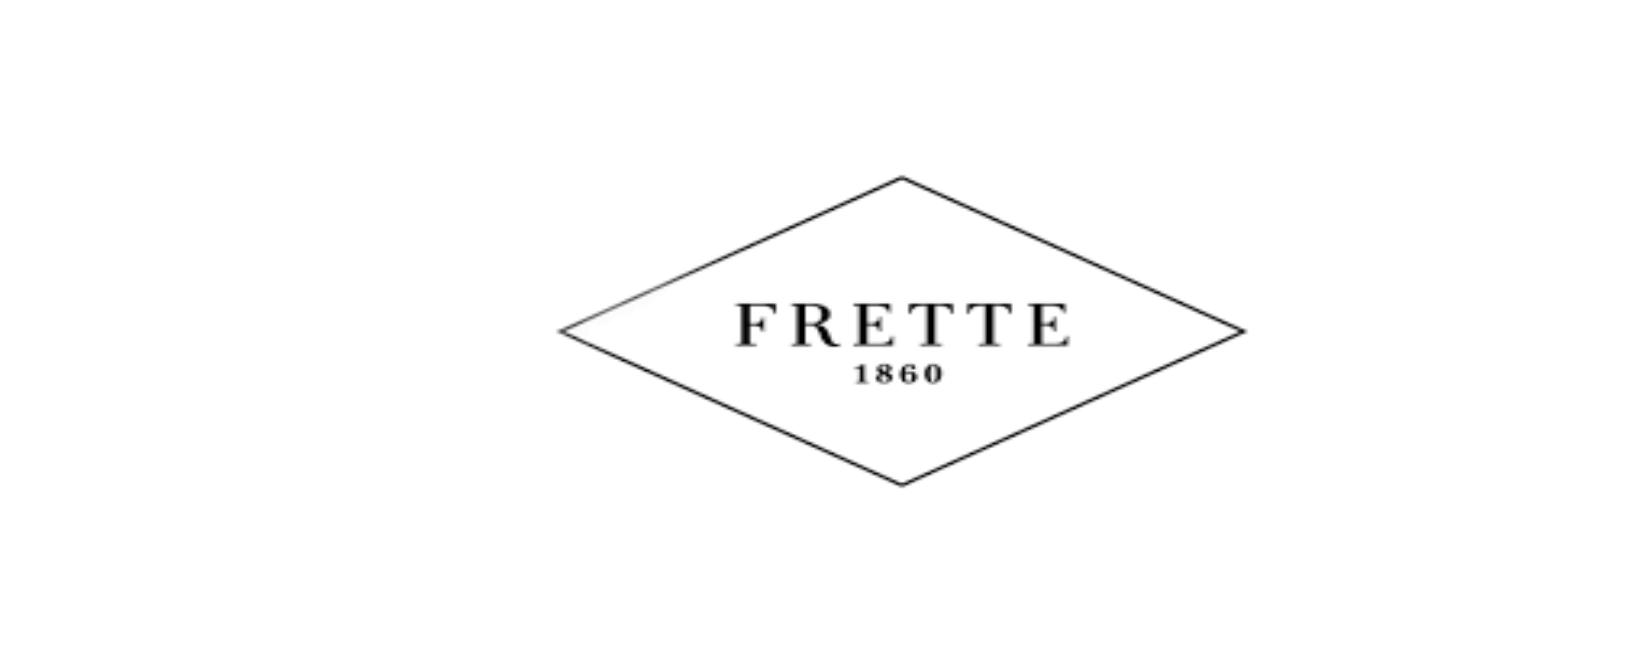 Frette Discount Code 2021